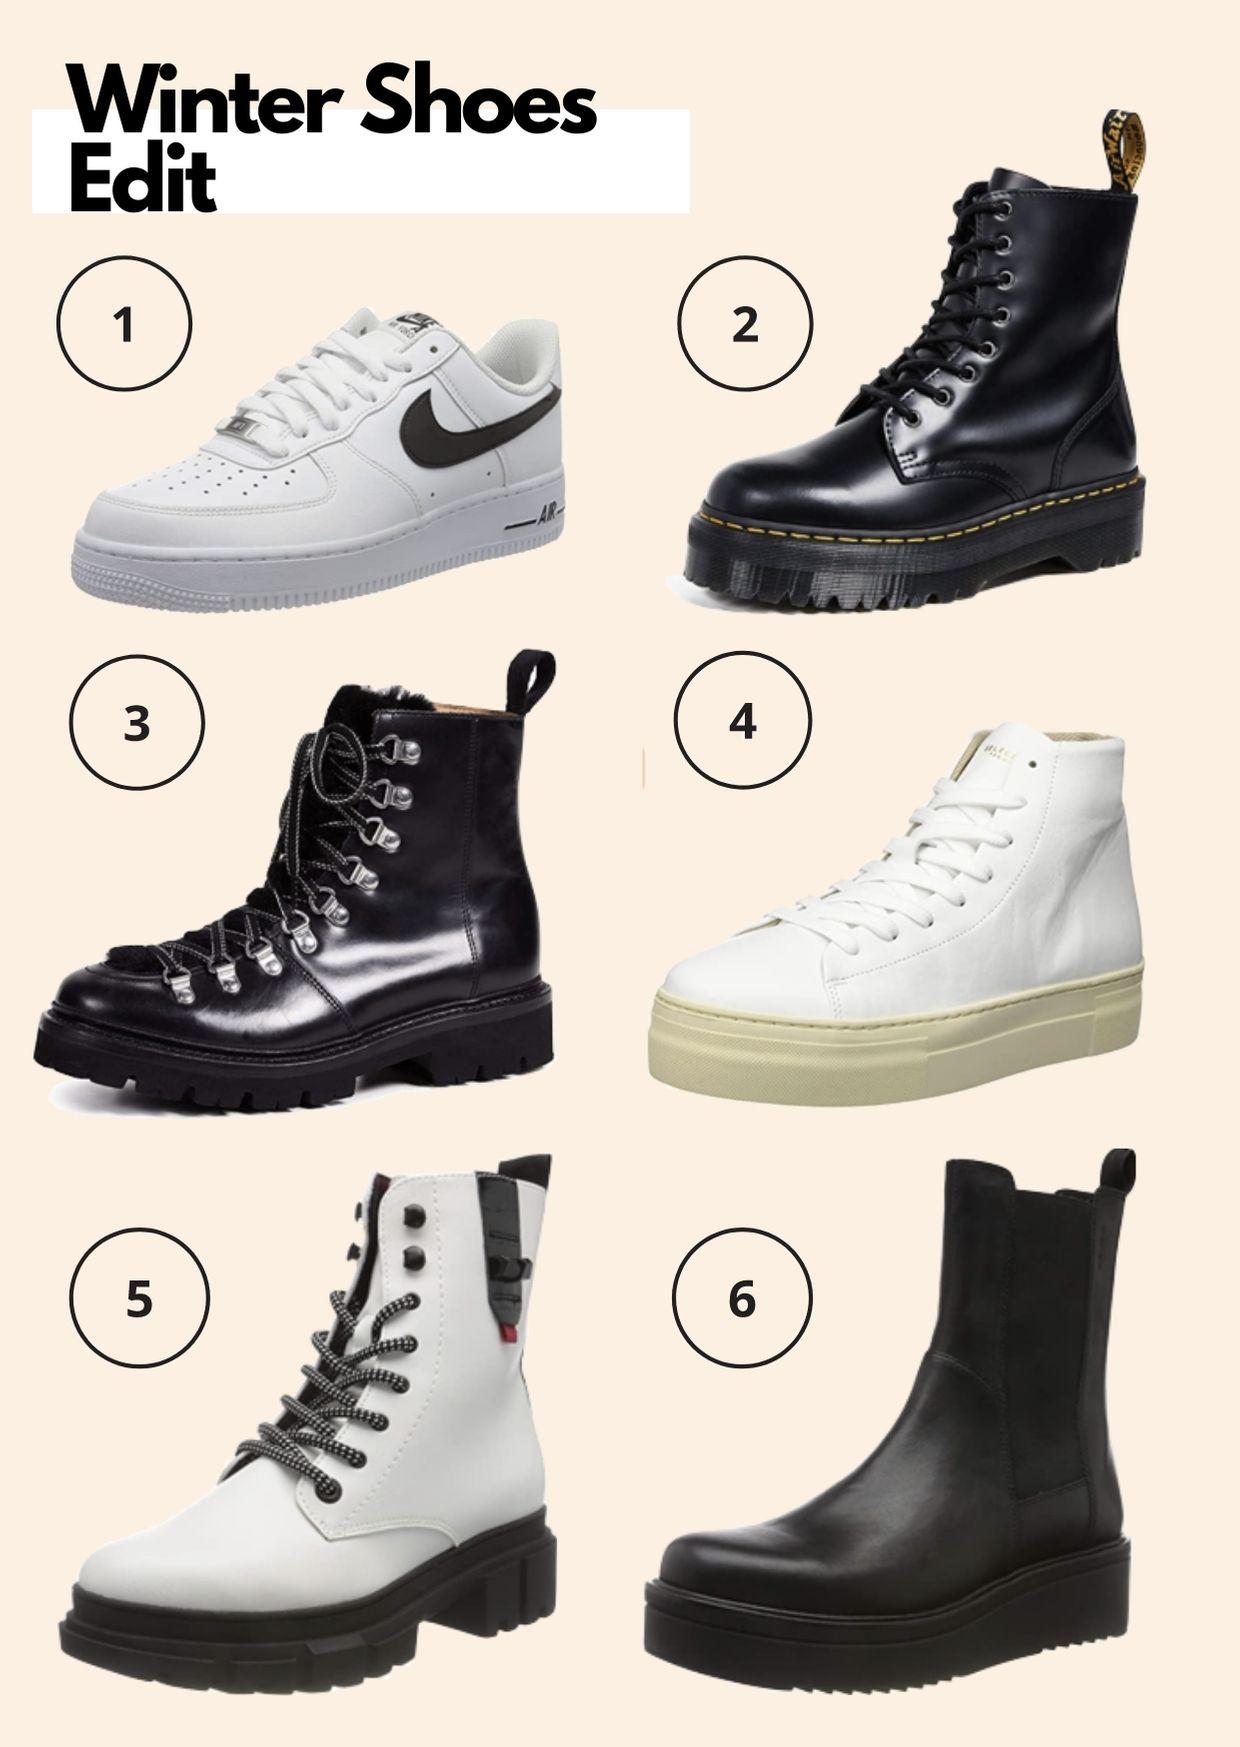 Amazon Fashion Winter Boot Edit